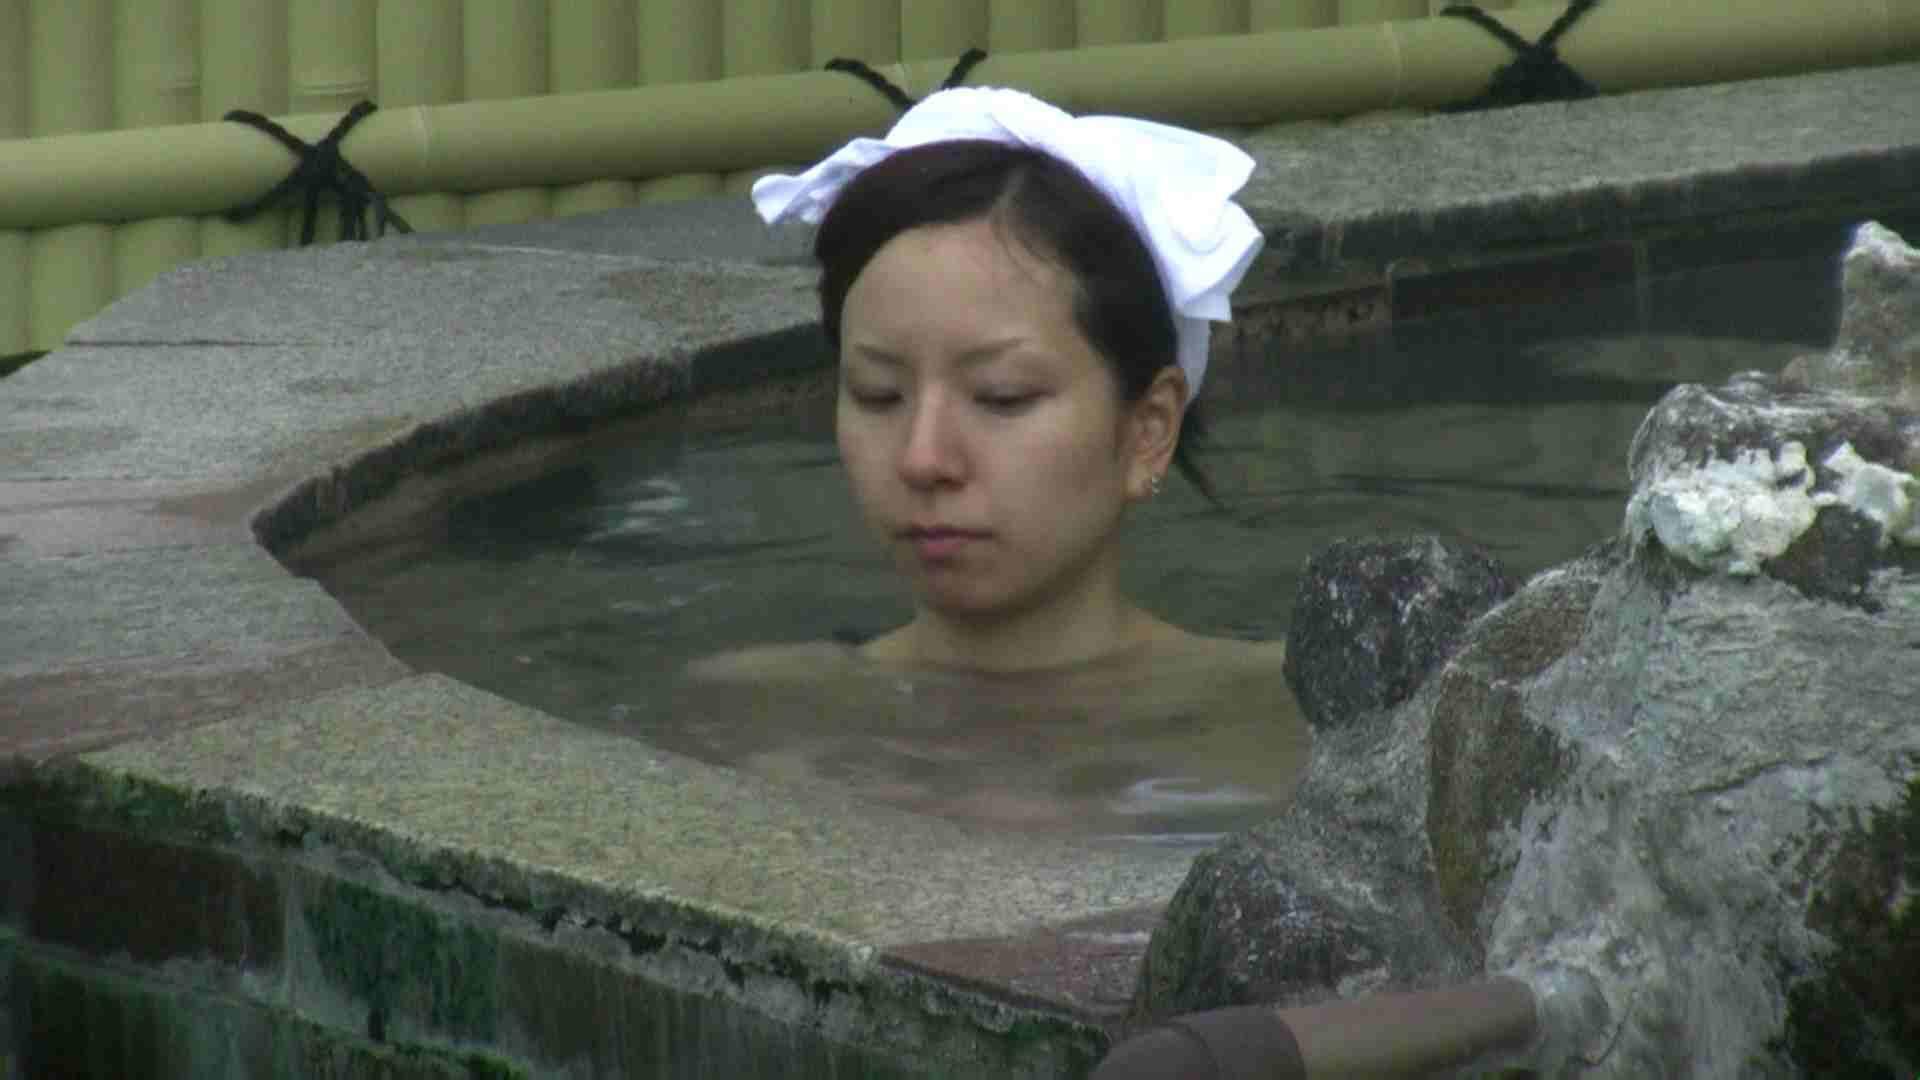 Aquaな露天風呂Vol.39【VIP】 綺麗なOLたち オマンコ動画キャプチャ 111枚 29